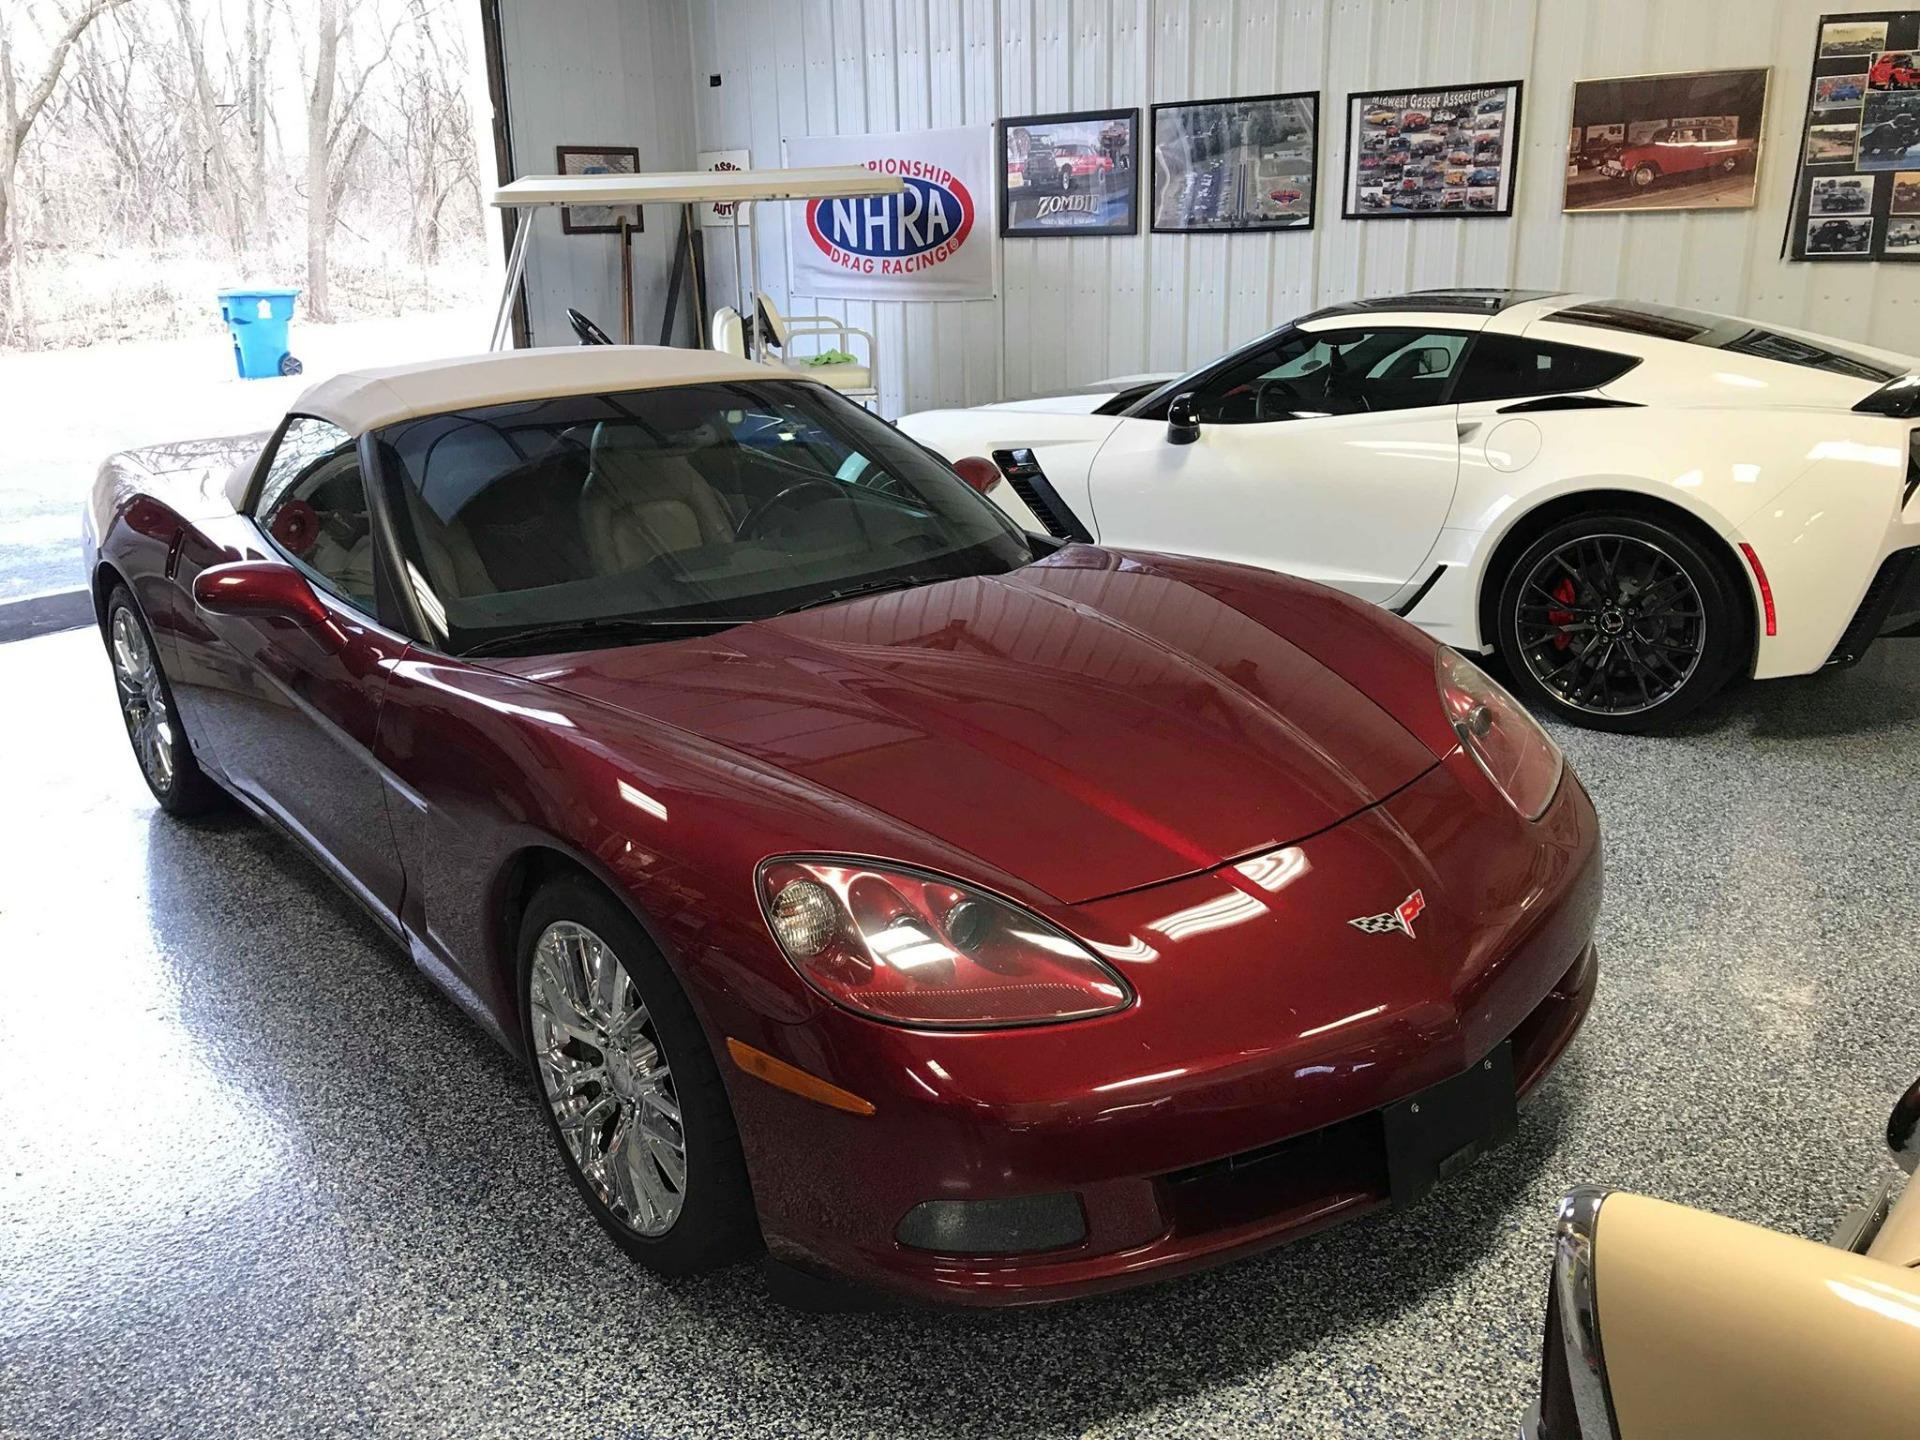 Used 2007 Chevrolet Corvette -SUPER NICE CONVERTIBLE SUMMER FUN- | Mundelein, IL